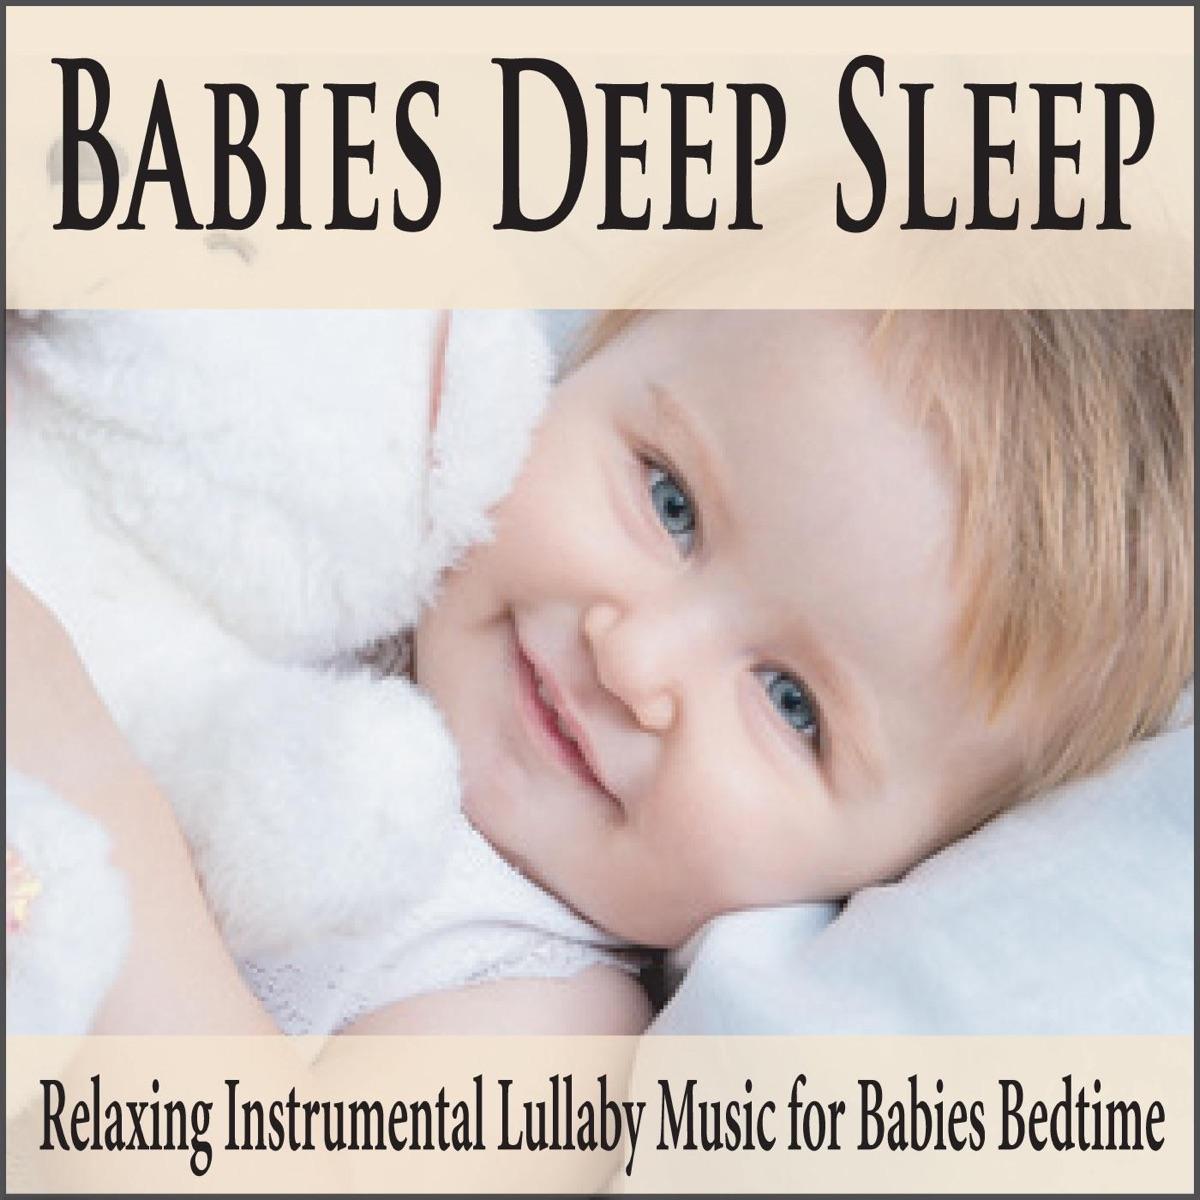 Babies Deep Sleep: Relaxing Instrumental Lullaby Music for